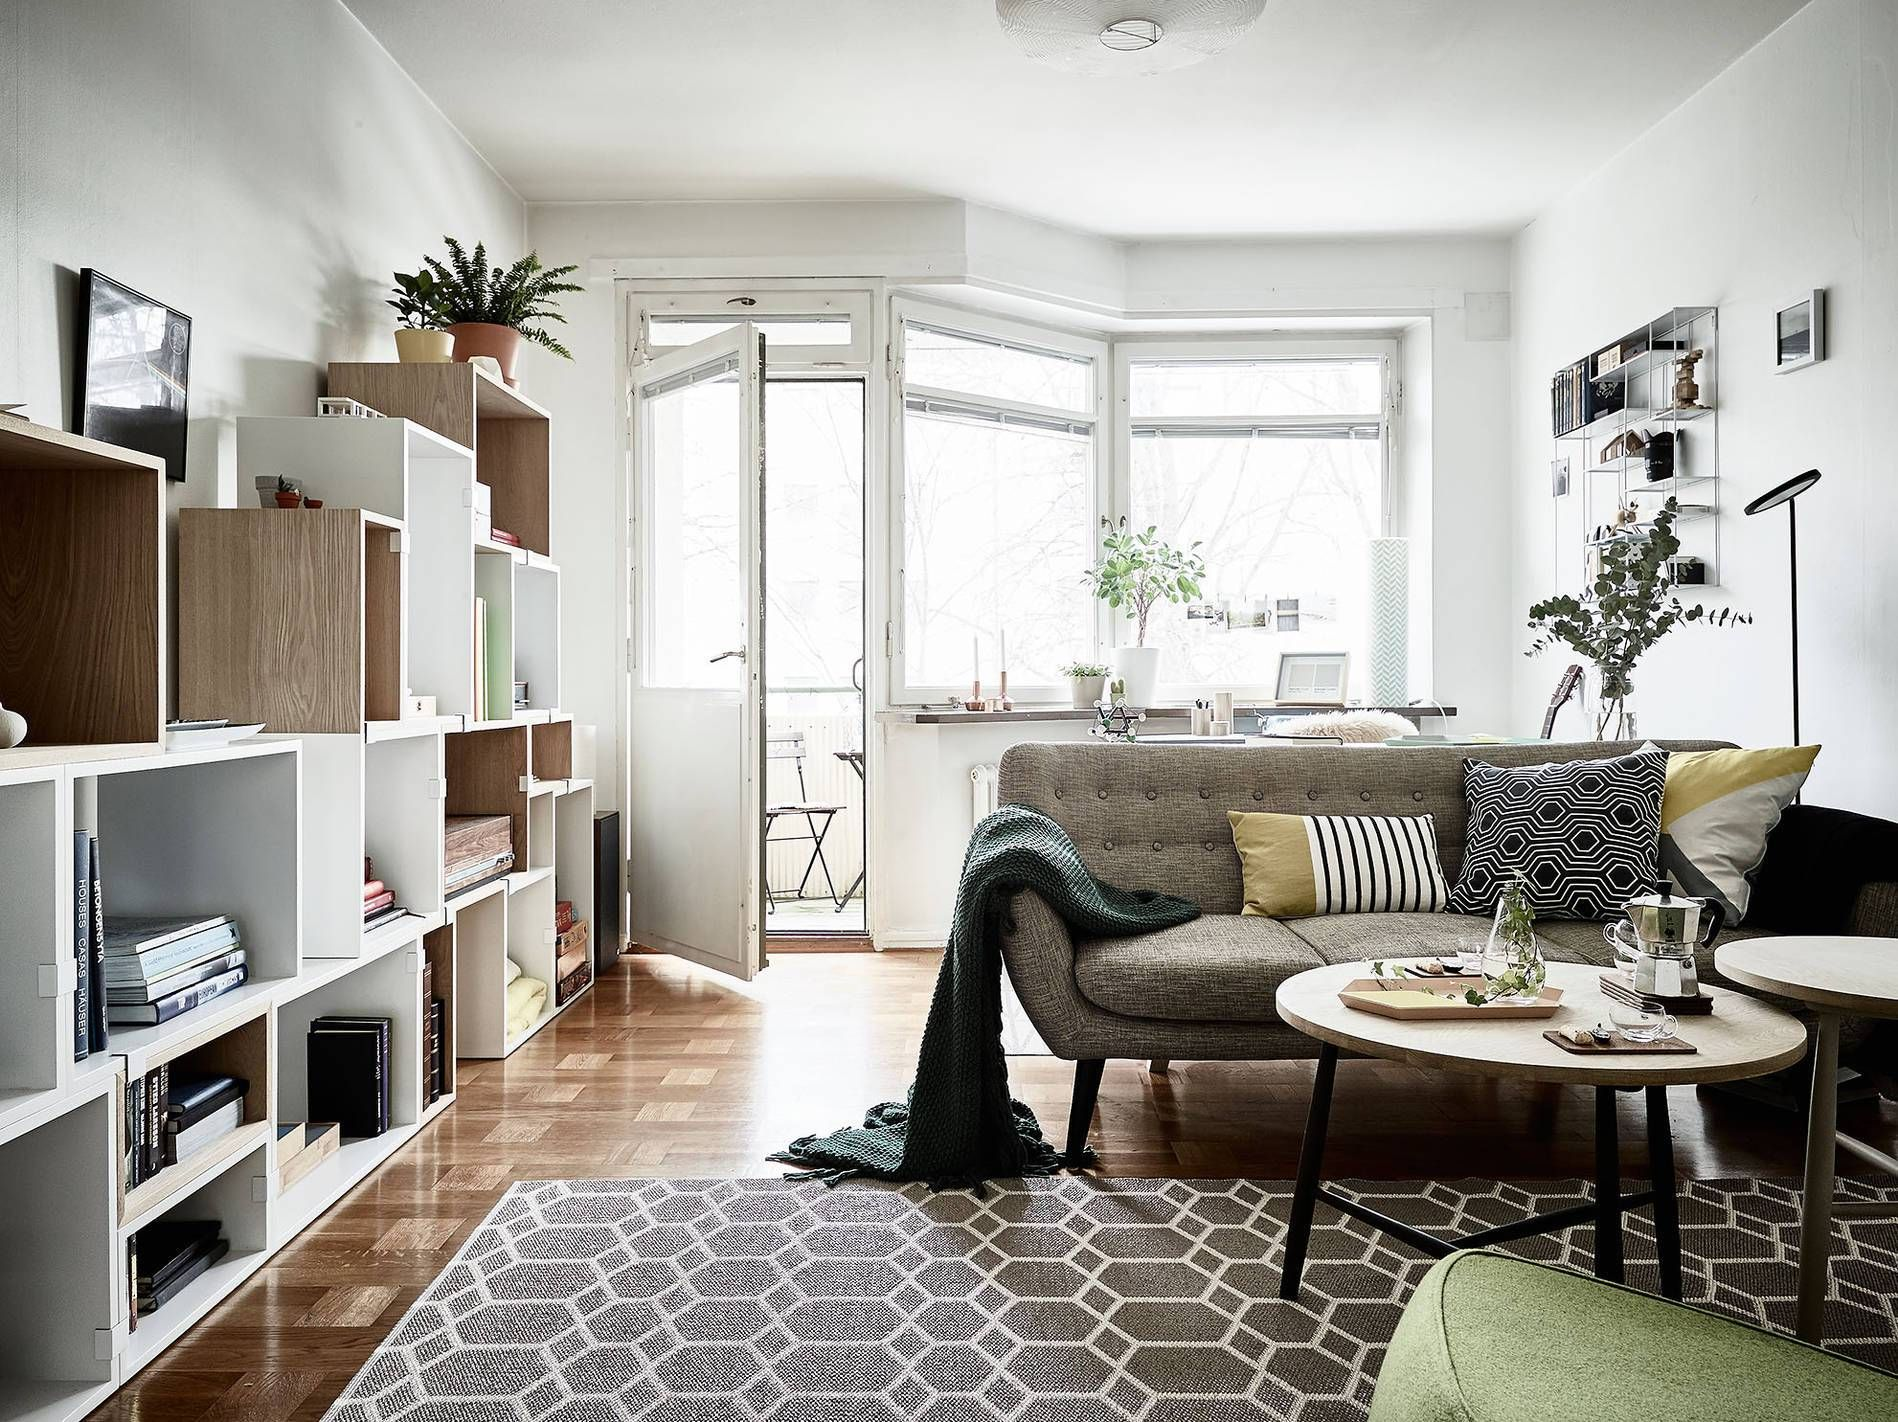 Image result for oficina almacenaje   Home   Pinterest   Interiors